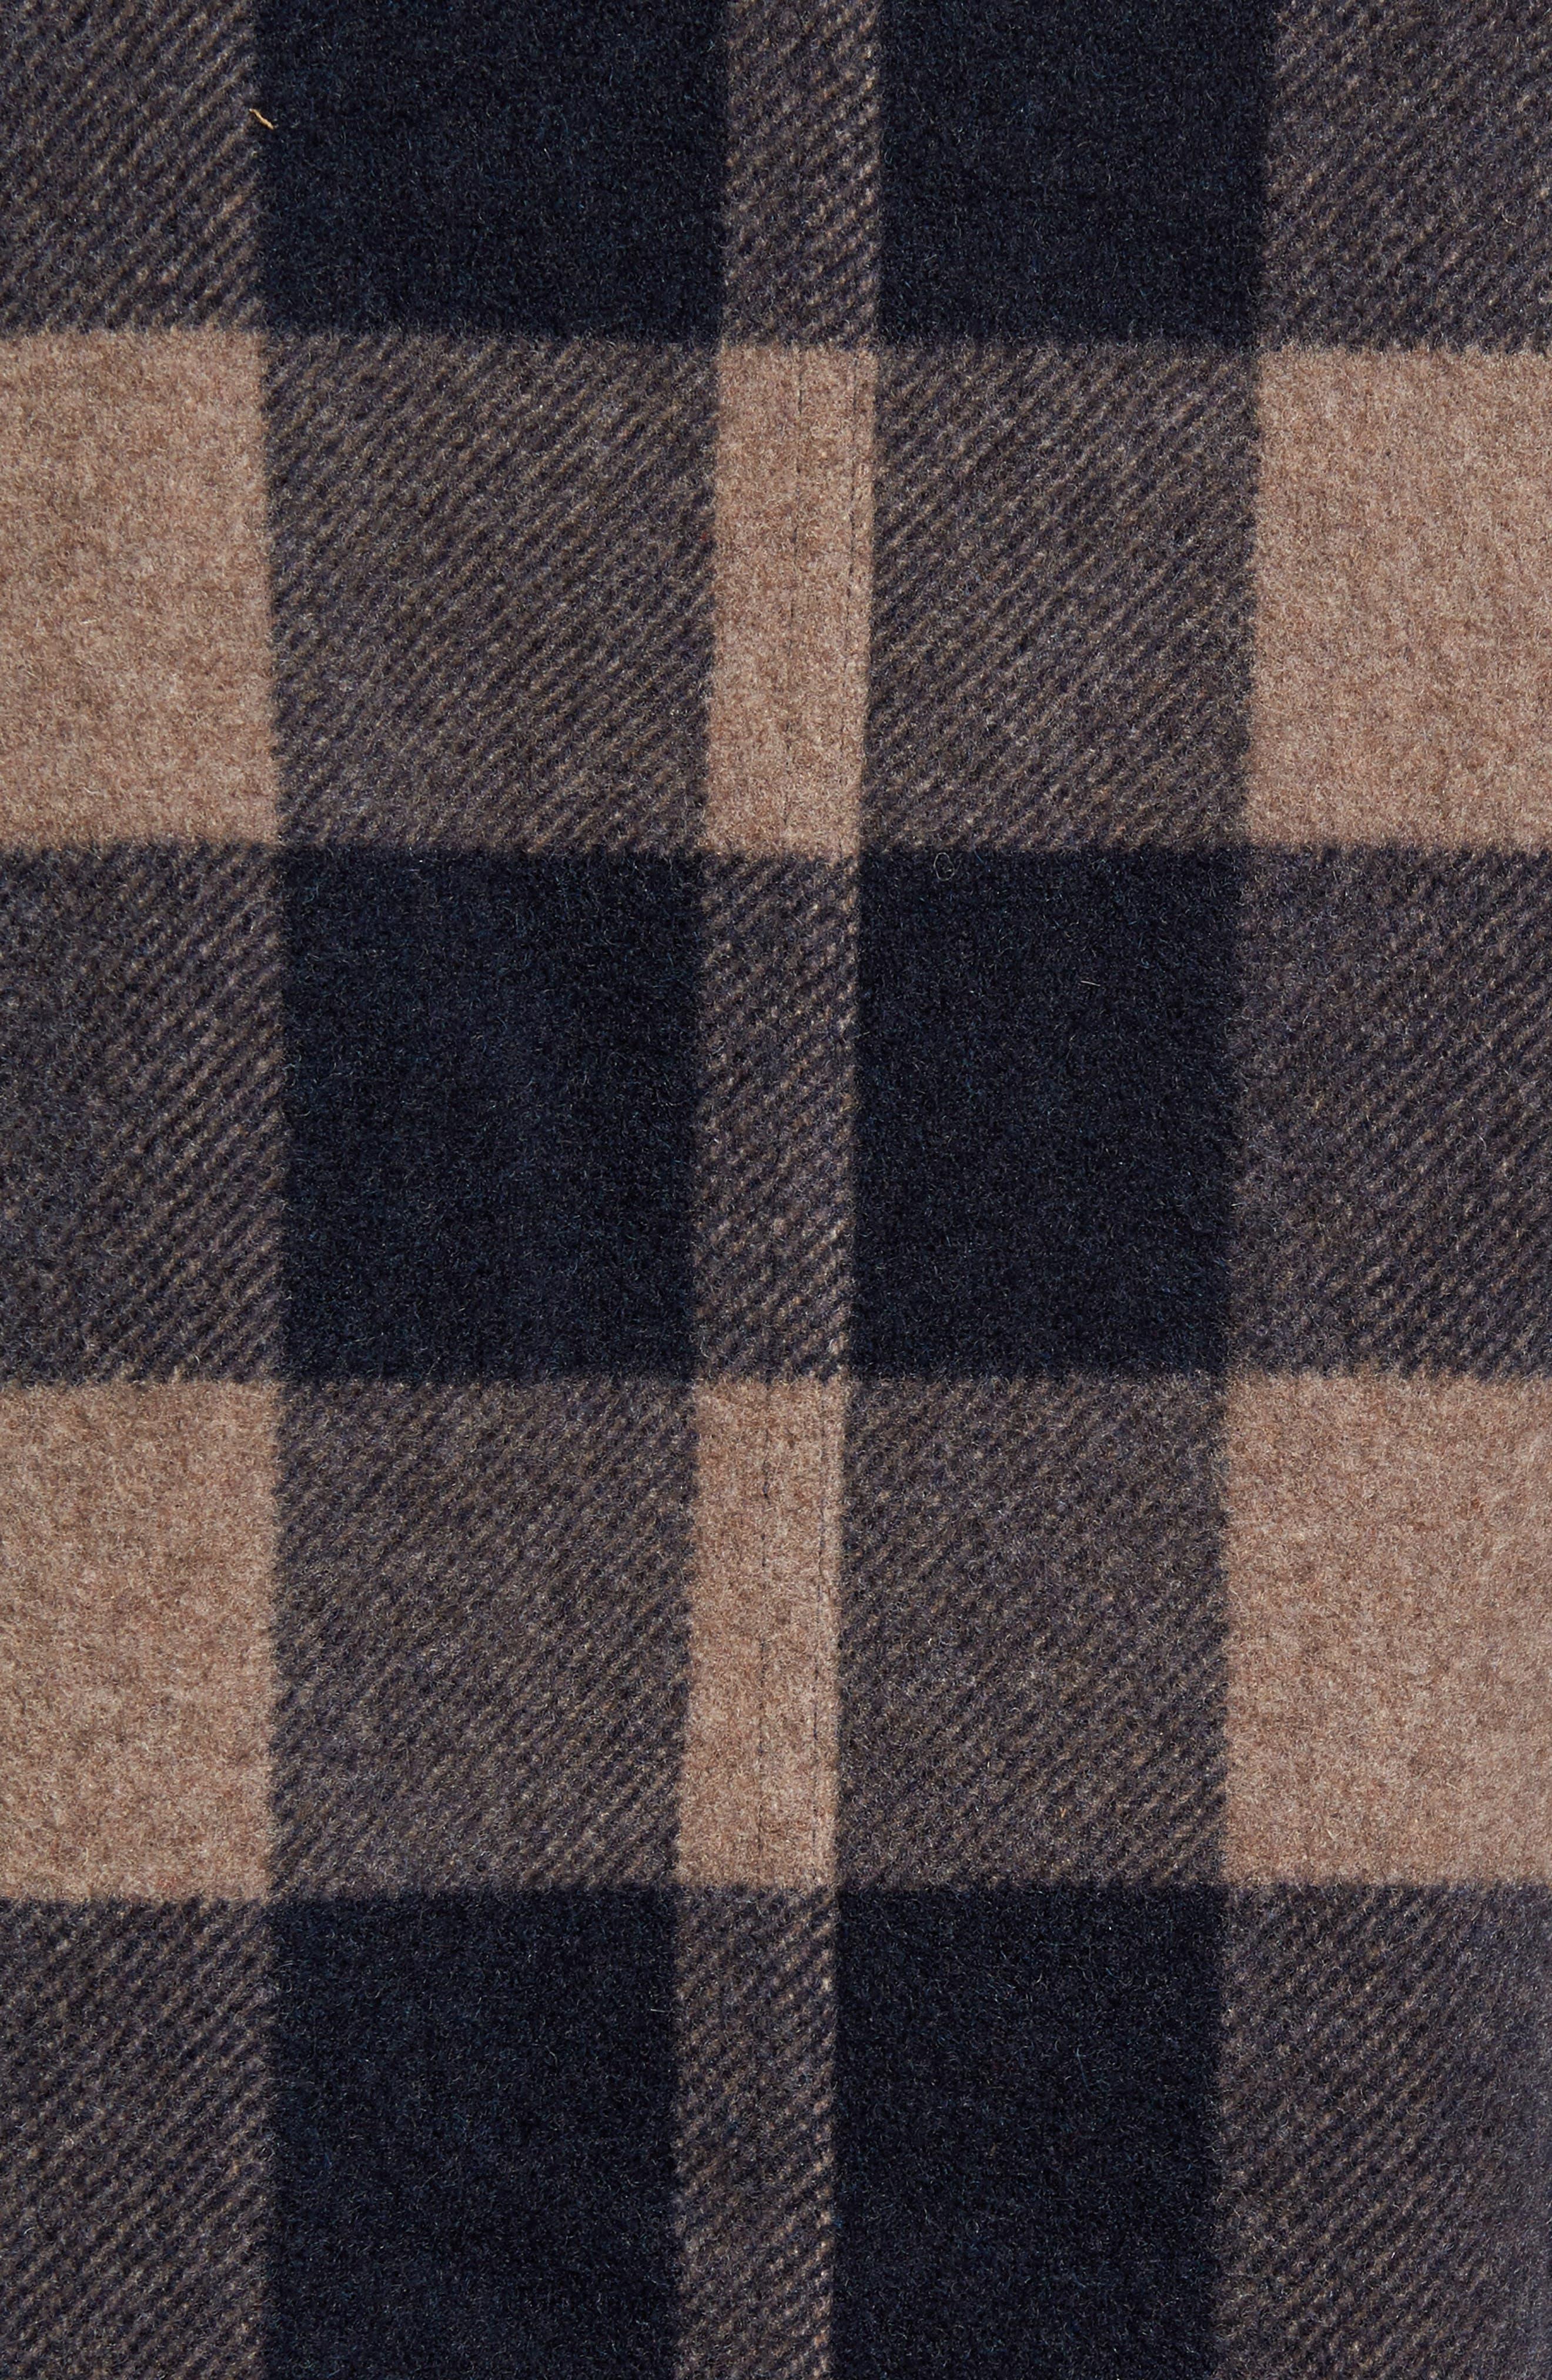 Anchor Line Flannel Shirt Jacket,                             Alternate thumbnail 5, color,                             Navy